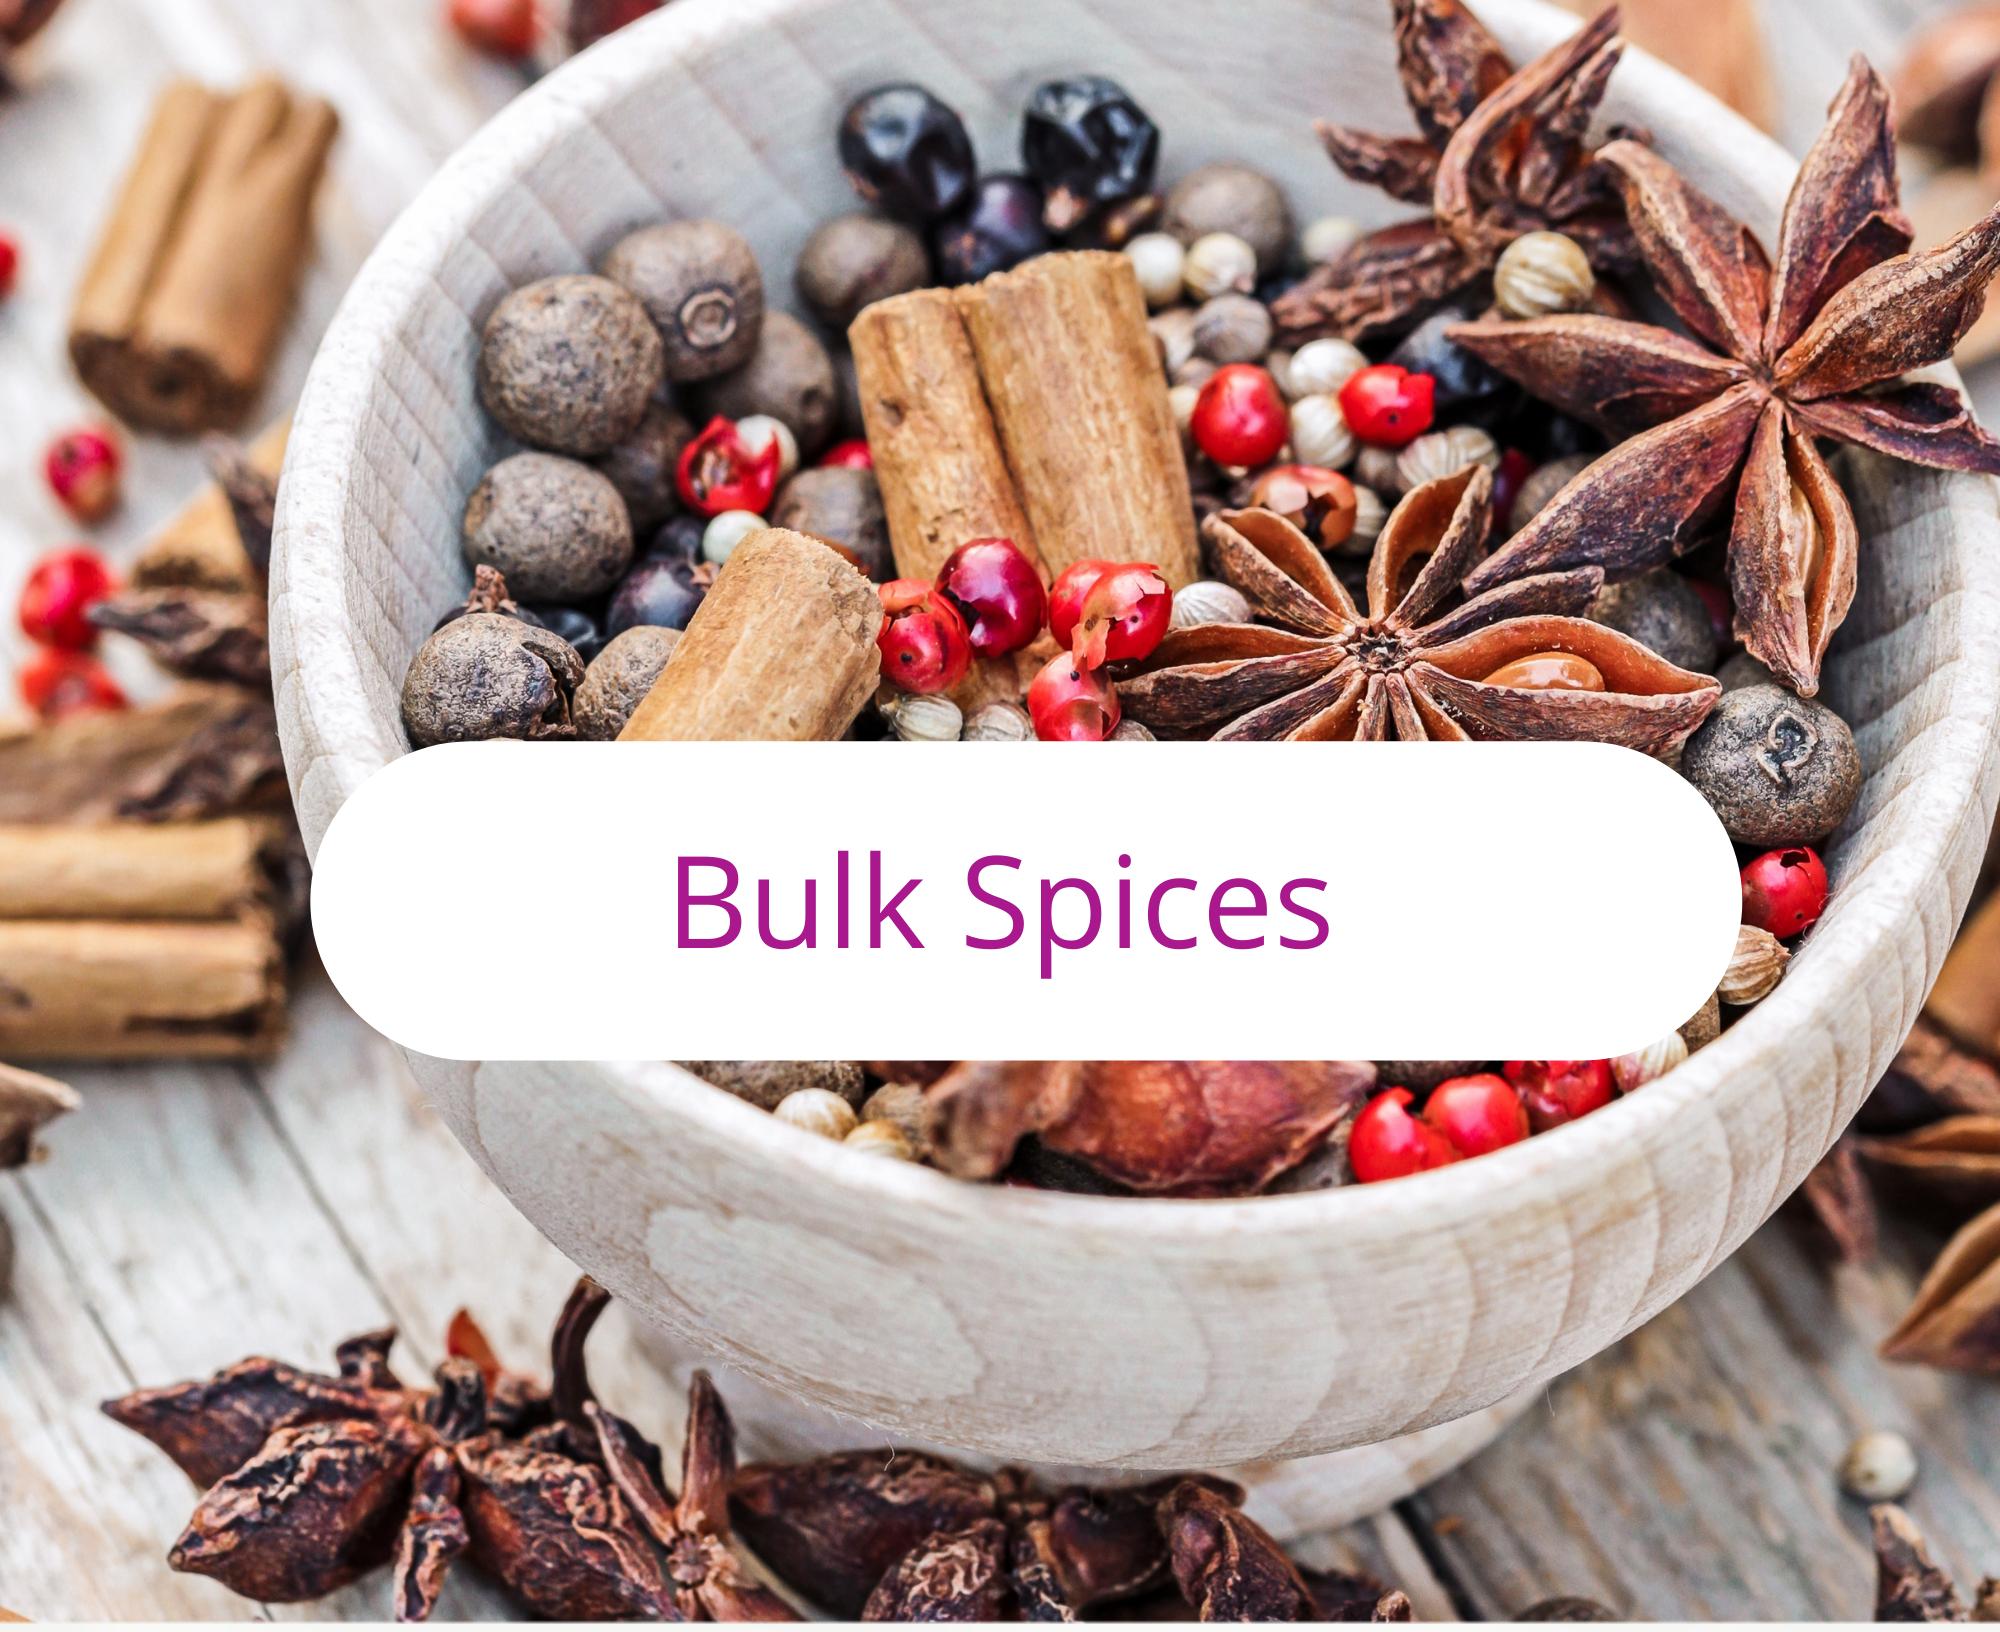 Spices, Bulk Spices, Chai Spices